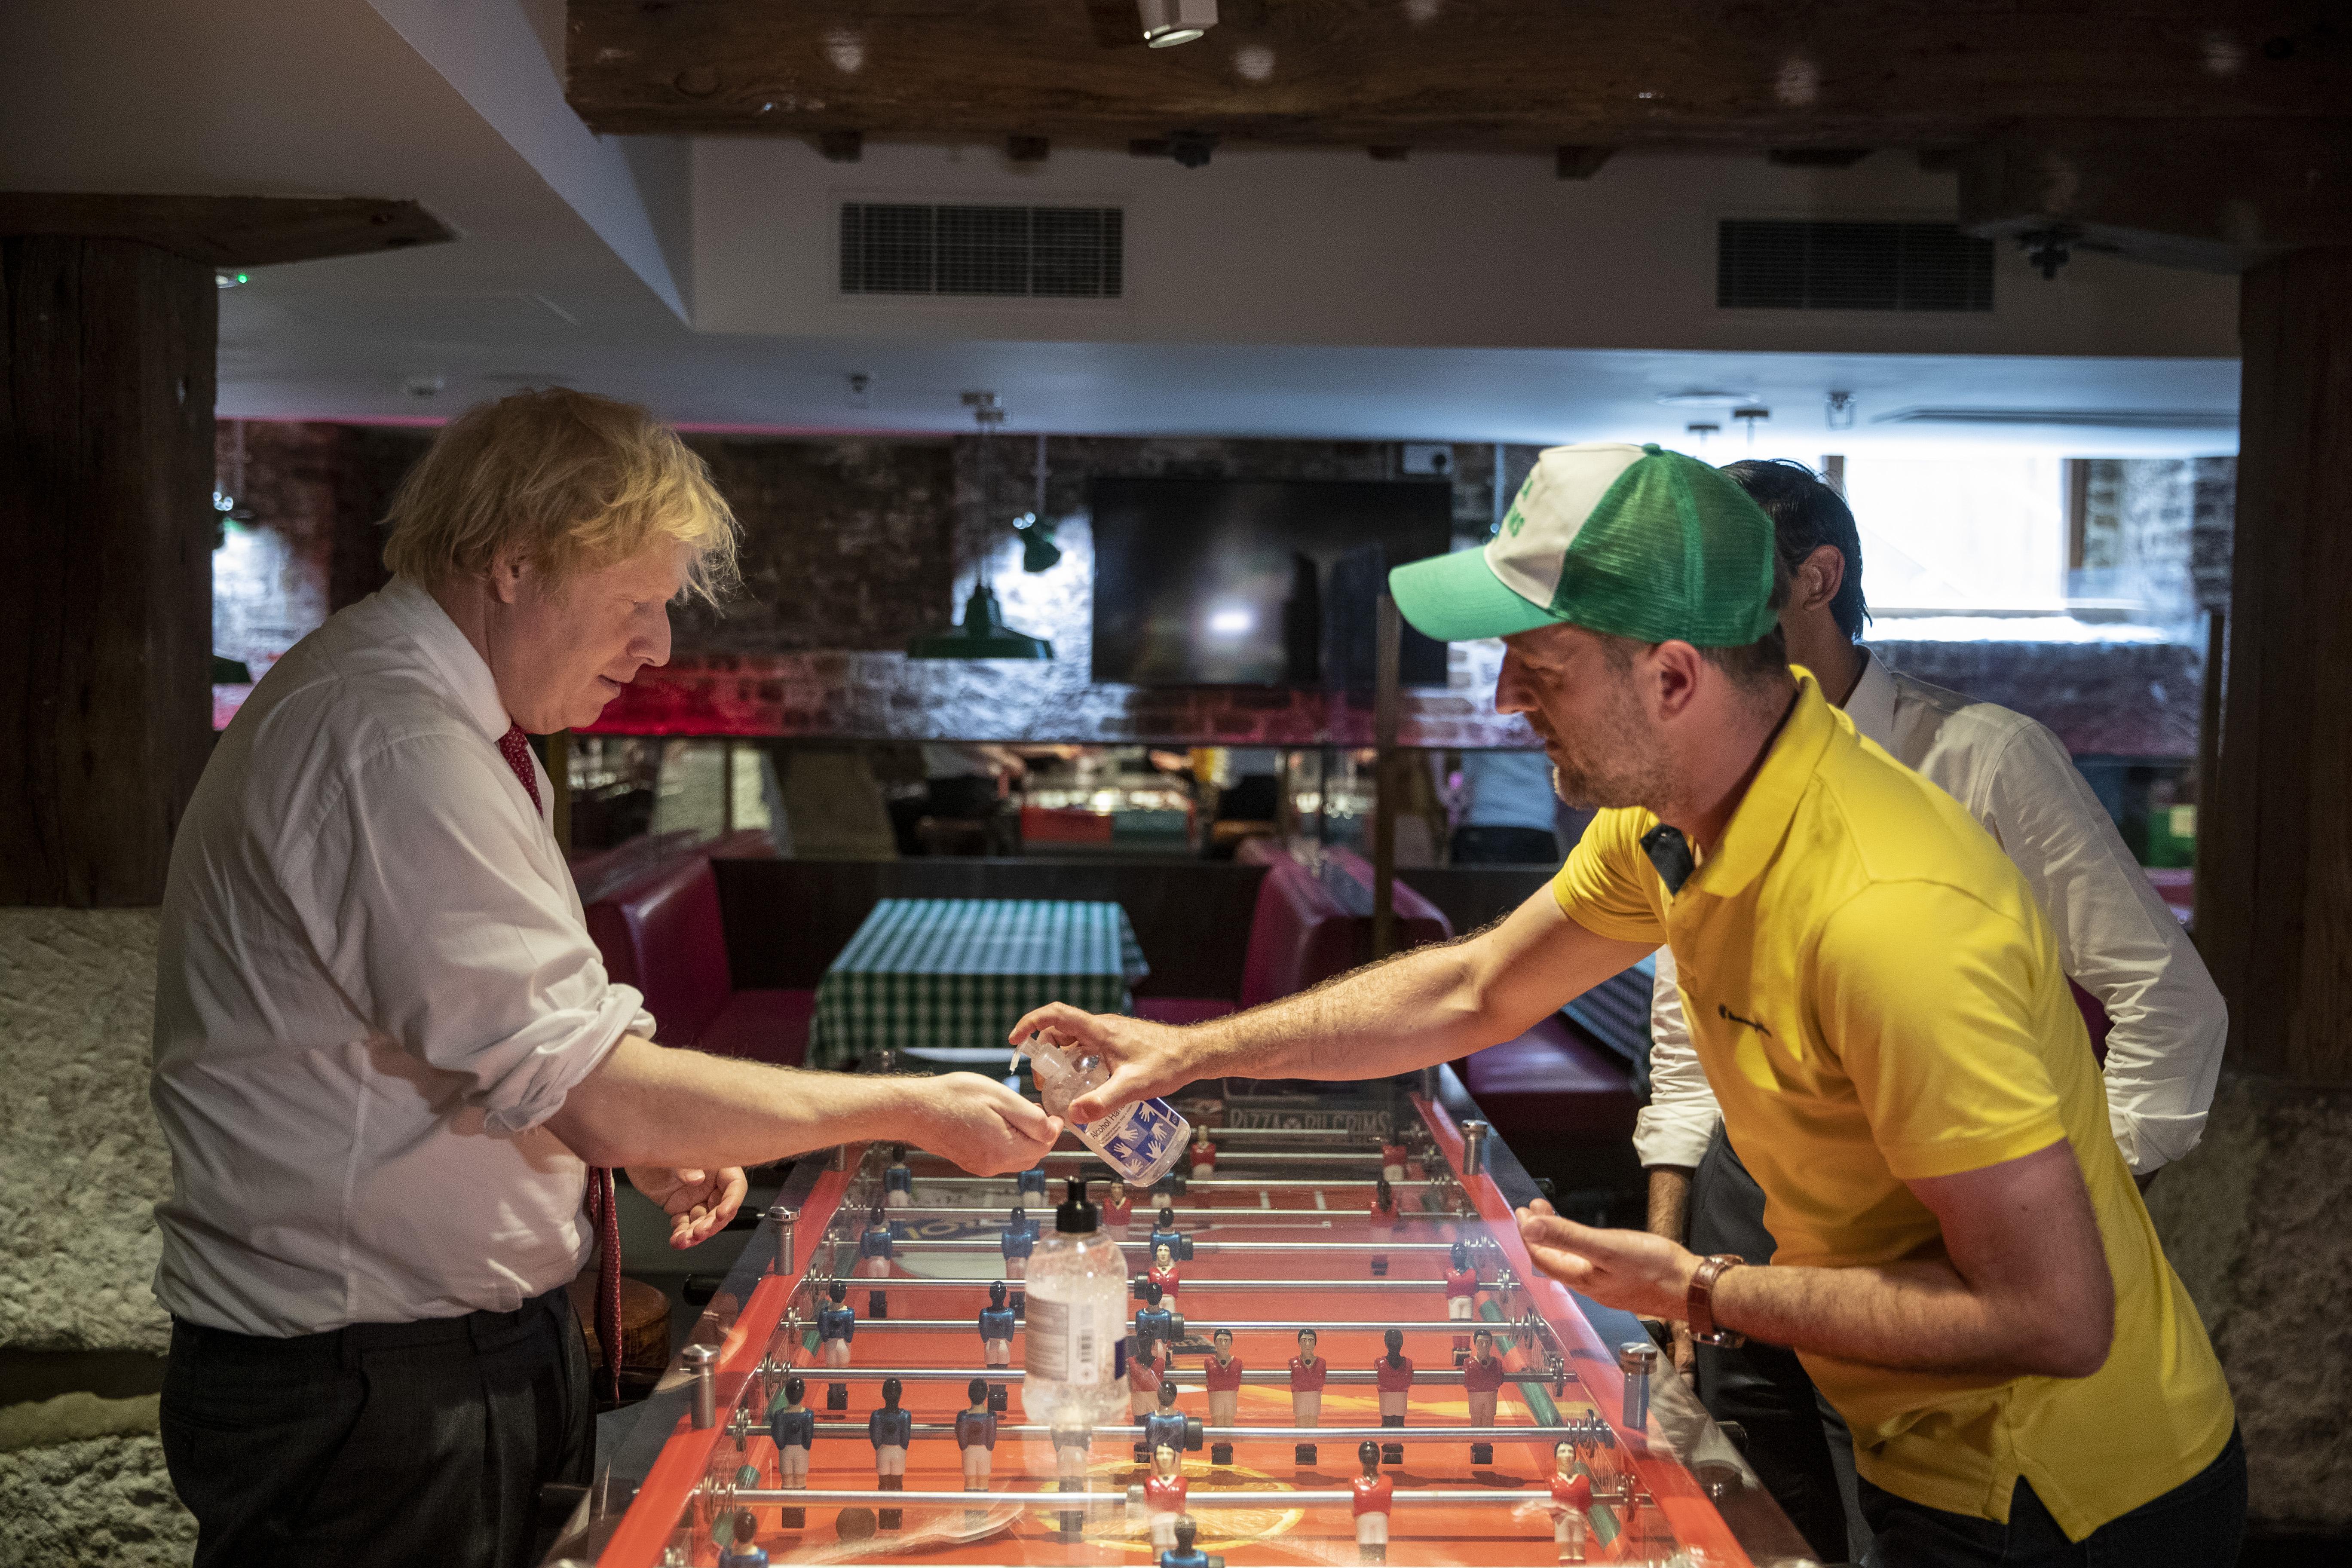 The UK Prime Minister And Chancellor Visit An East London Restaurant Preparing To Open Post Coronavirus Lockdown